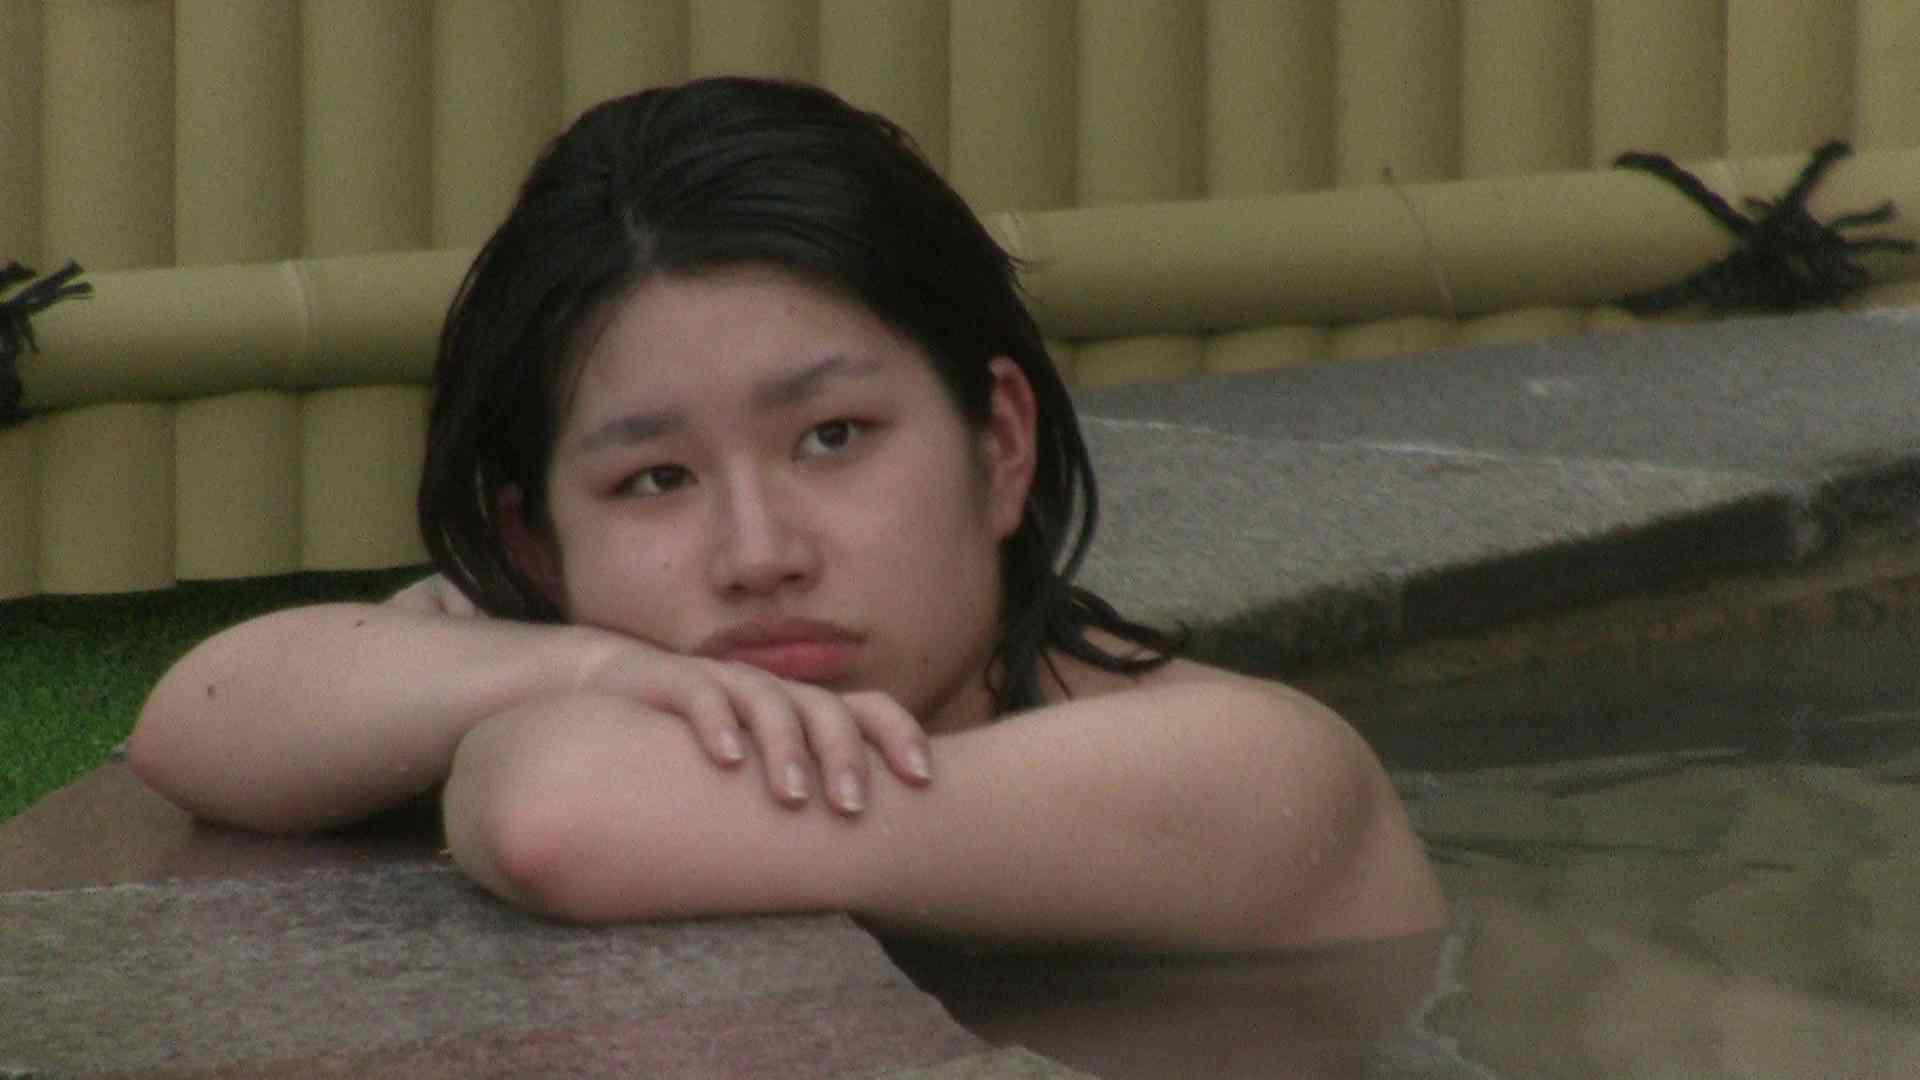 Aquaな露天風呂Vol.230 HなOL | 盗撮  83pic 35